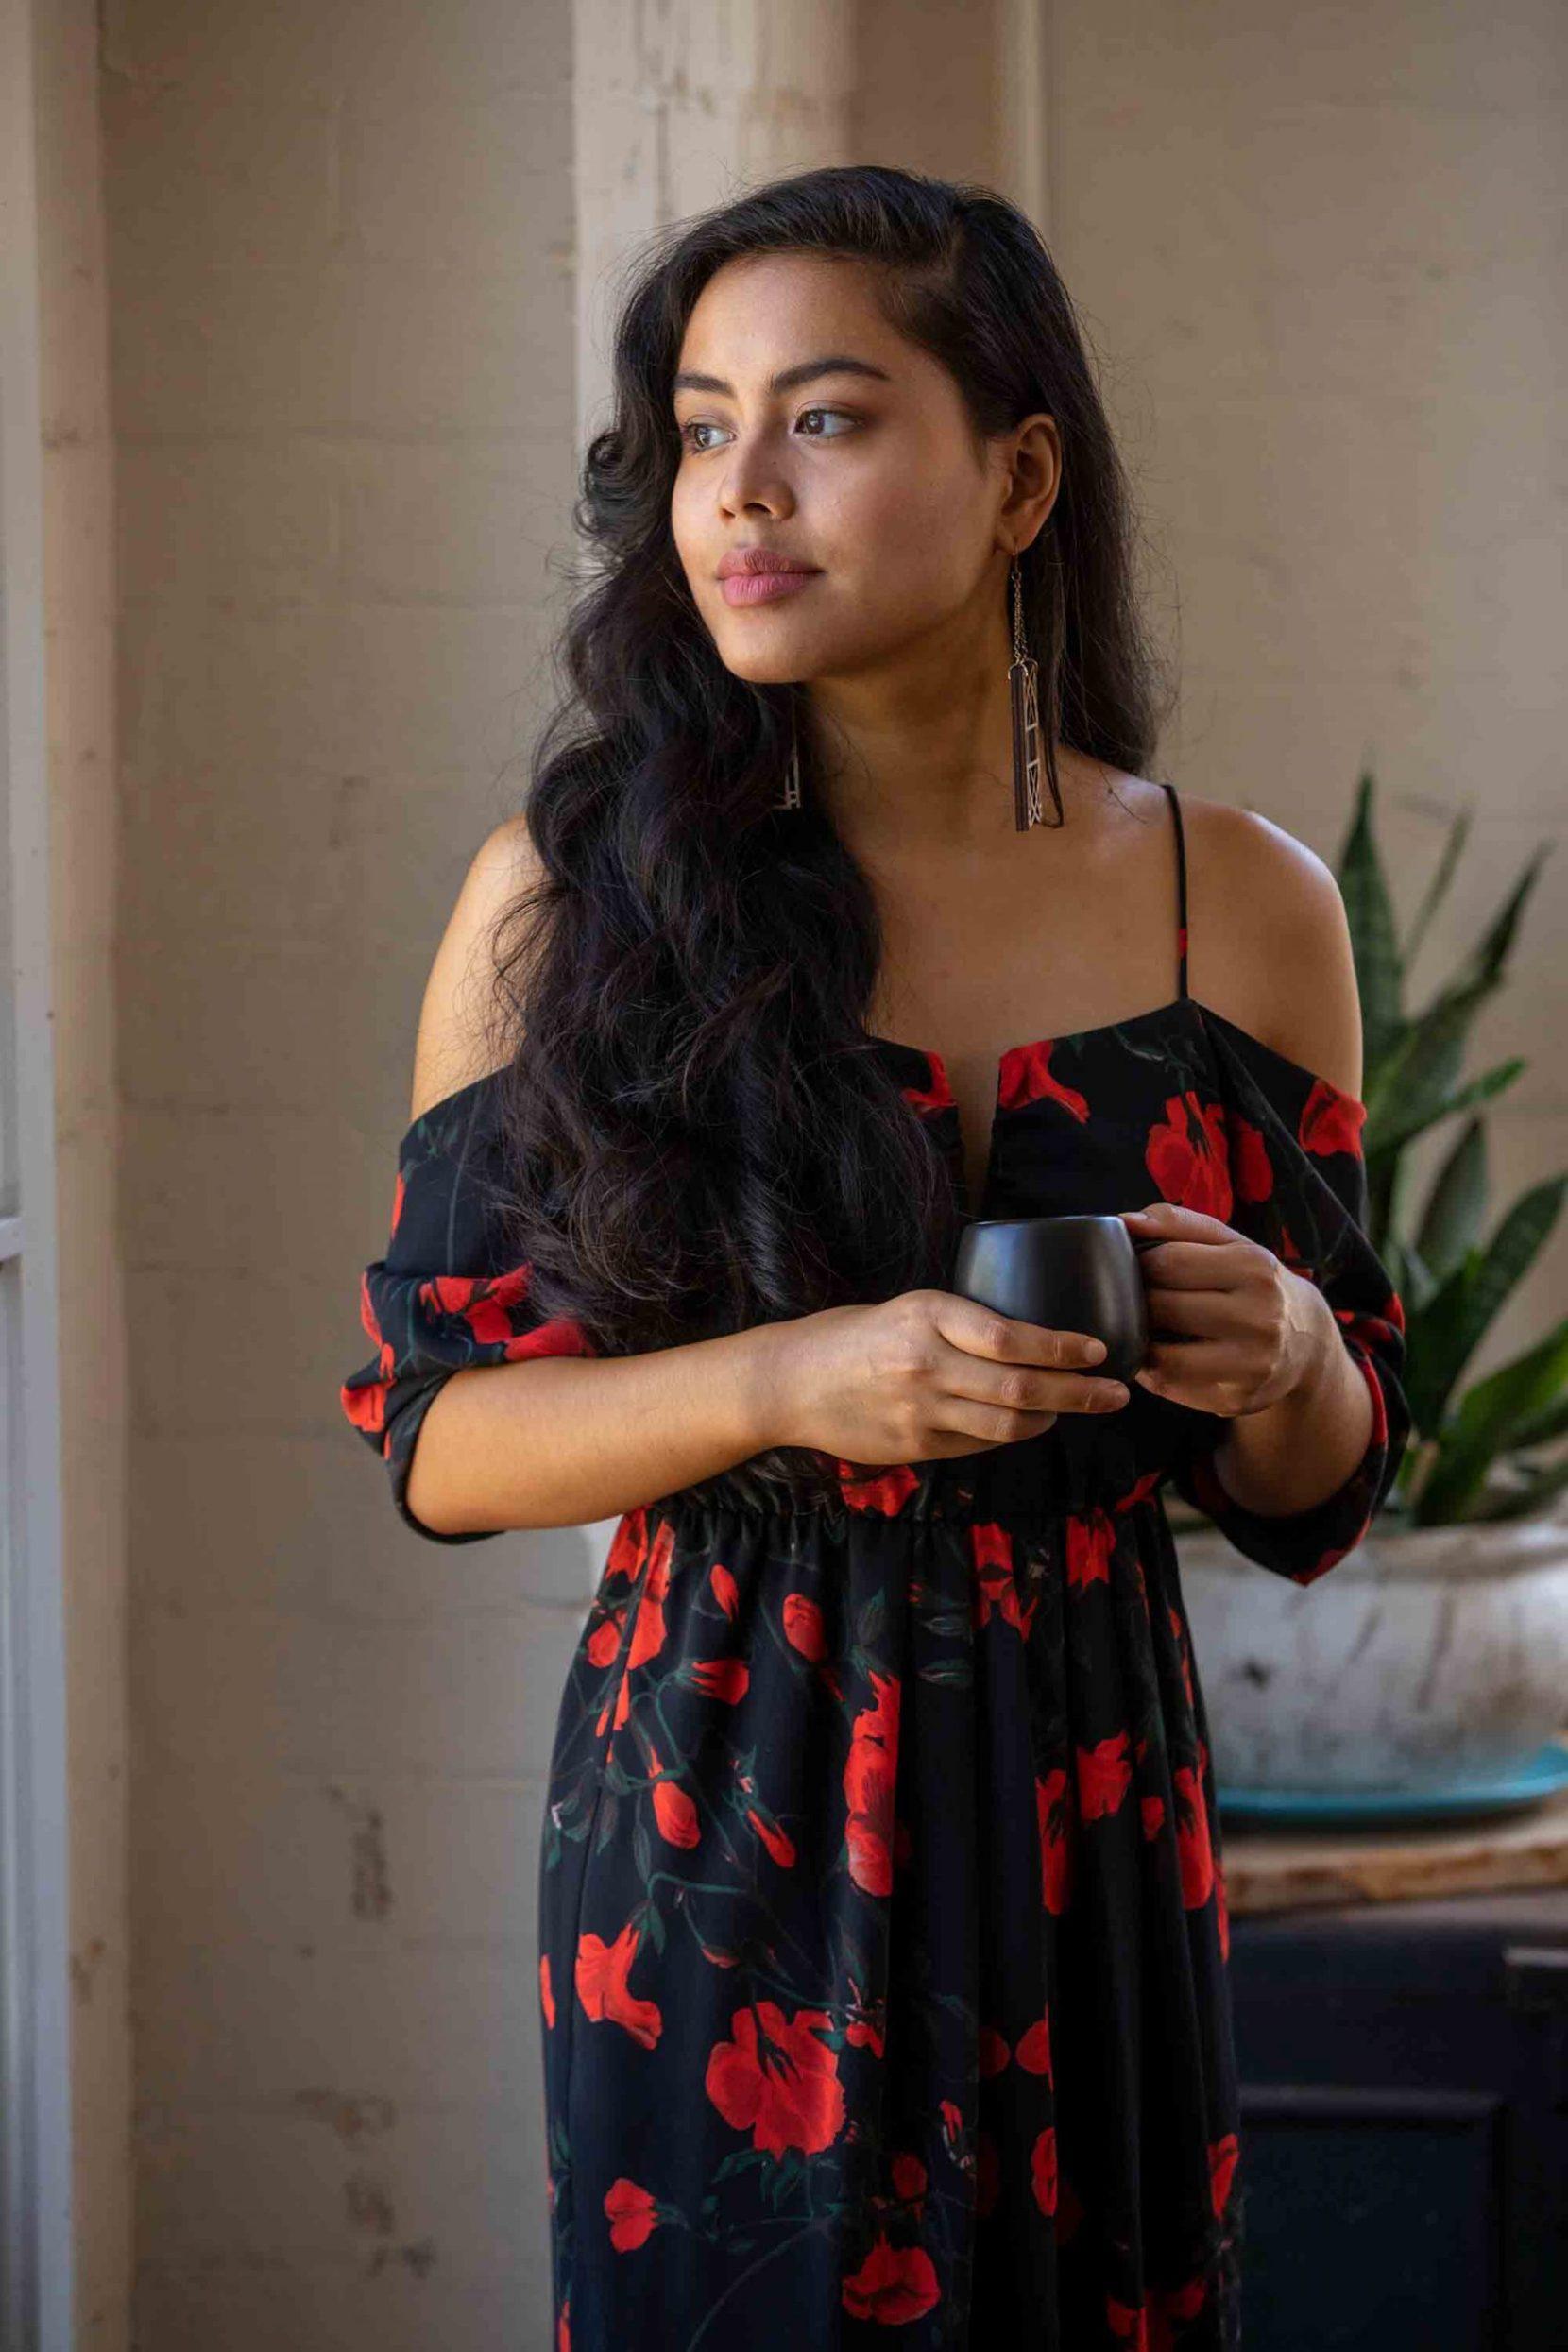 Slam poet Eunice Andrada